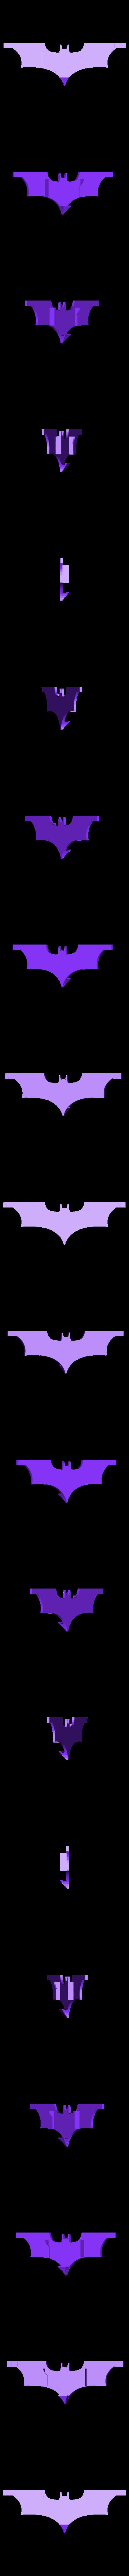 Shox_SNova_Bat_S6_Holder_V3.stl Download free STL file Shox Bat Beat Box • 3D print template, shawnrchq